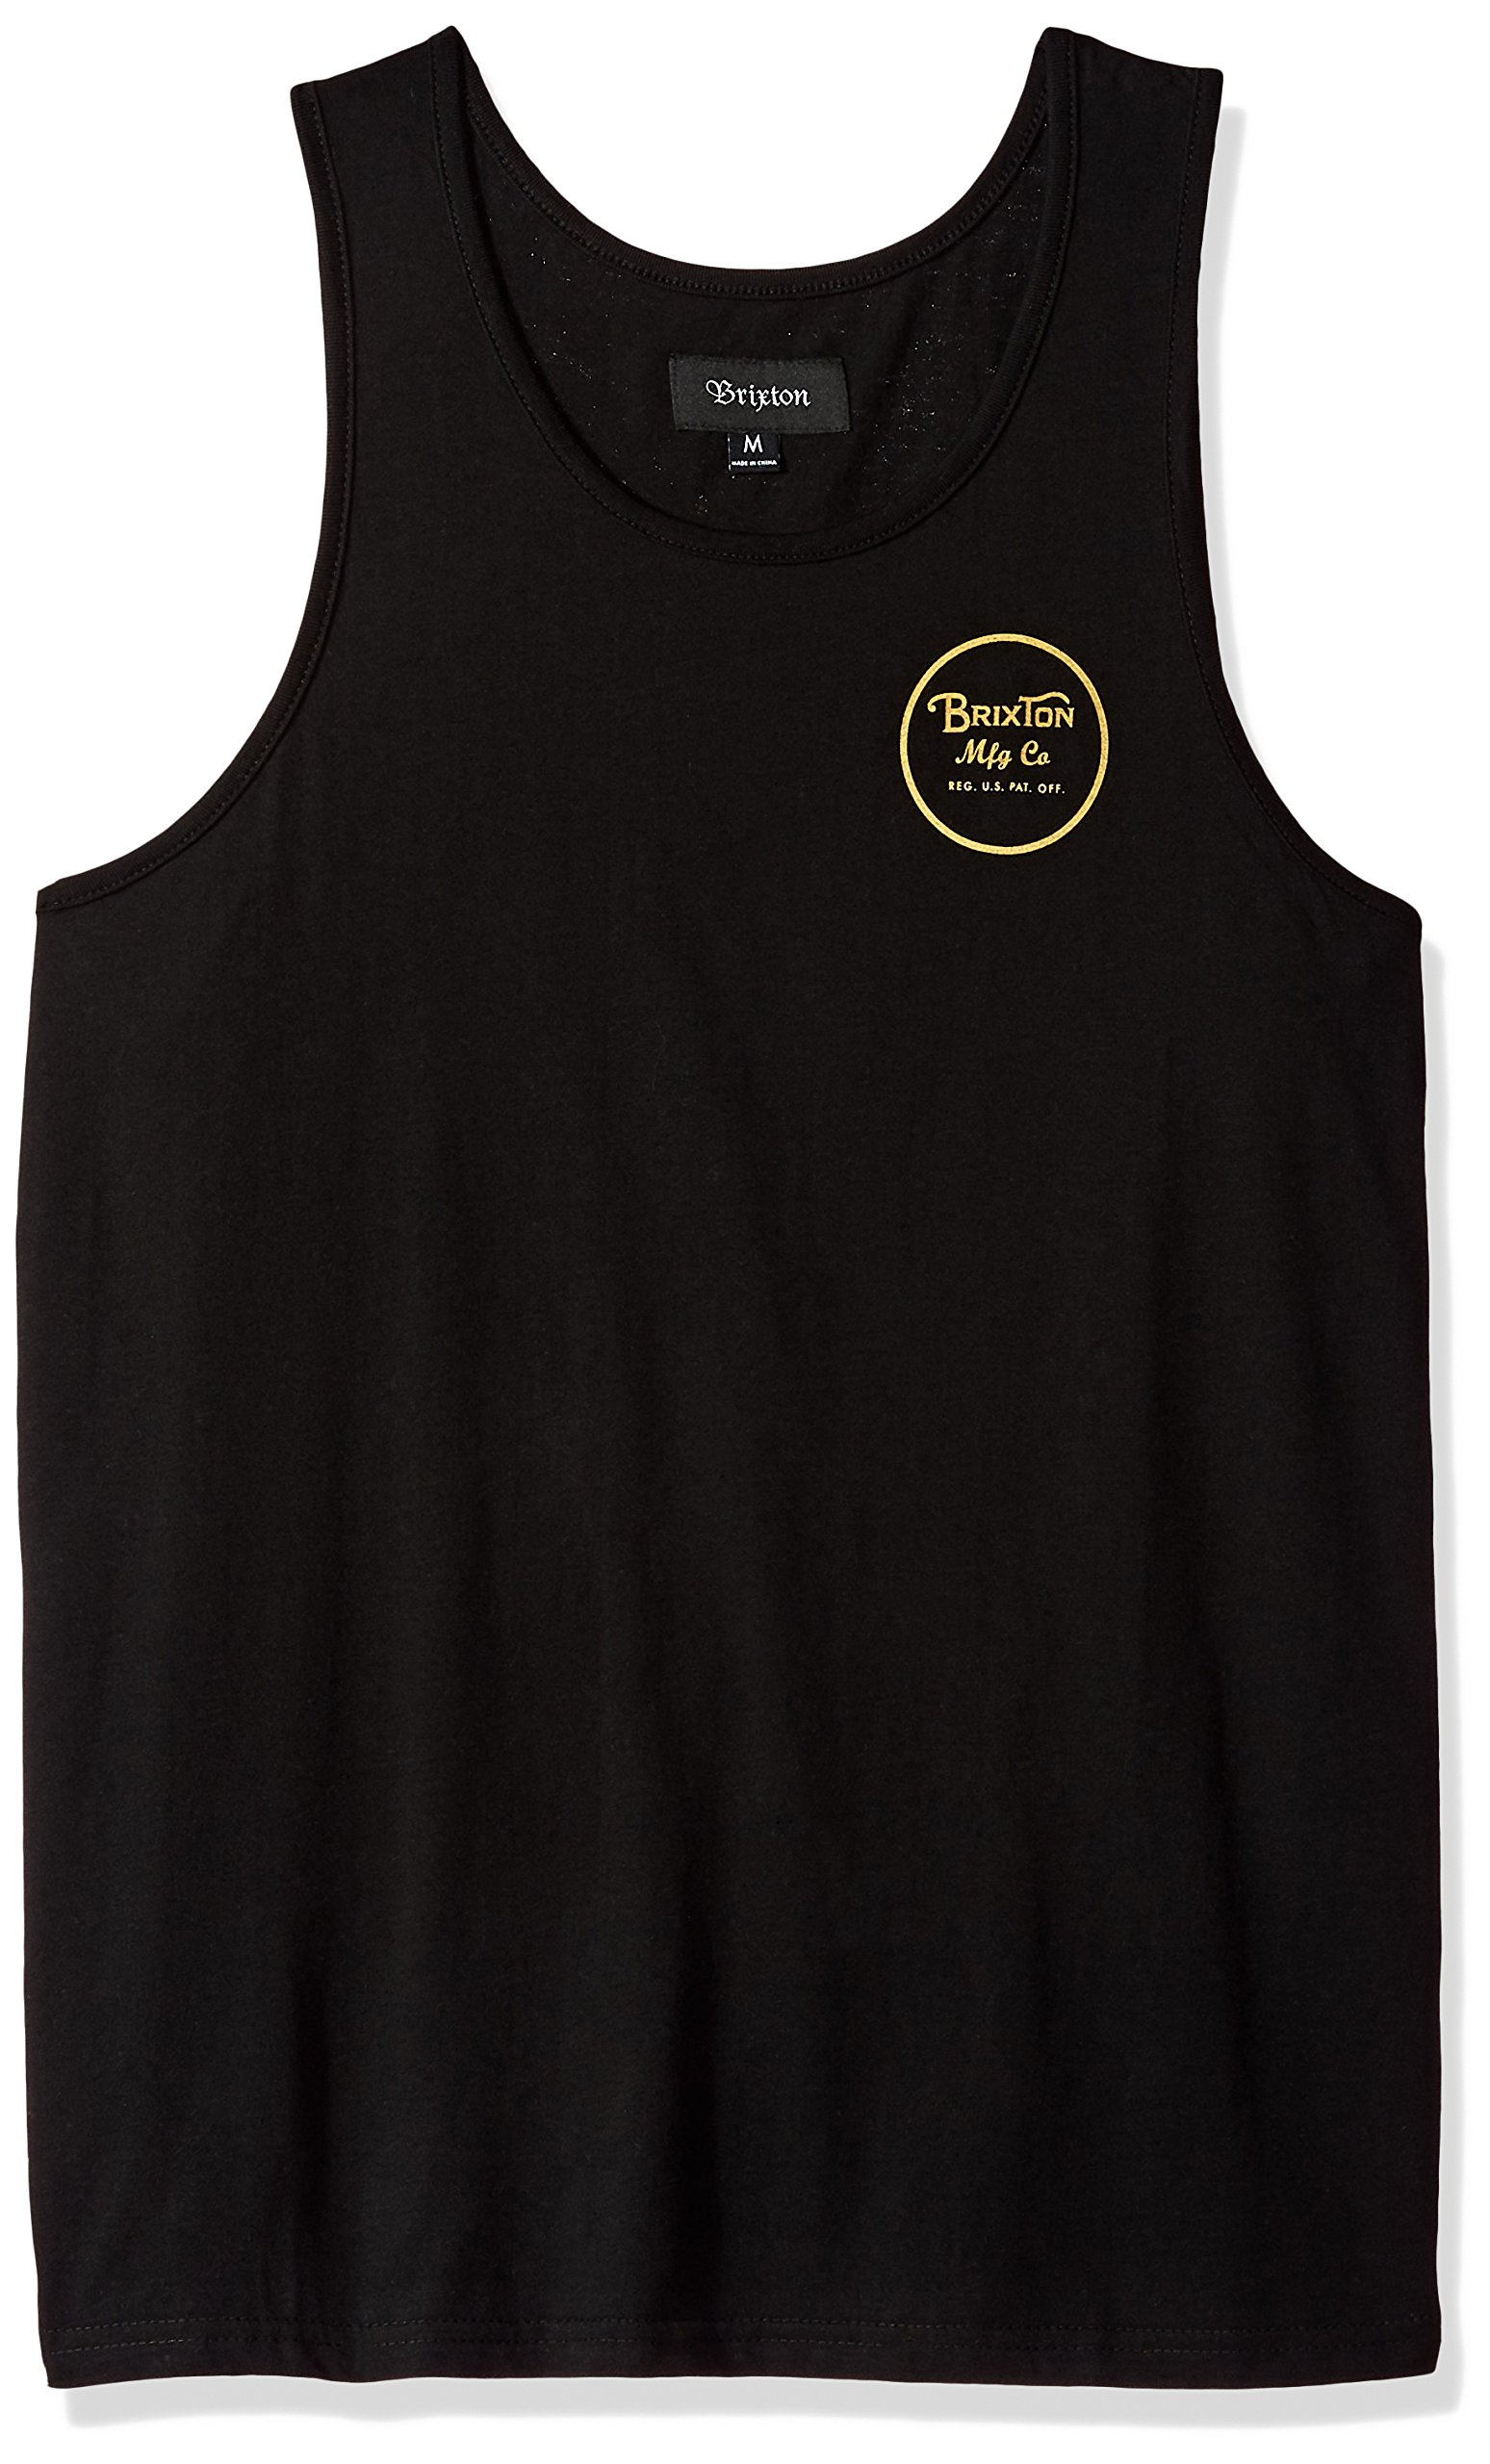 Brixton Men's Wheeler Tailored Fit Tank Top, Black/Gold, M